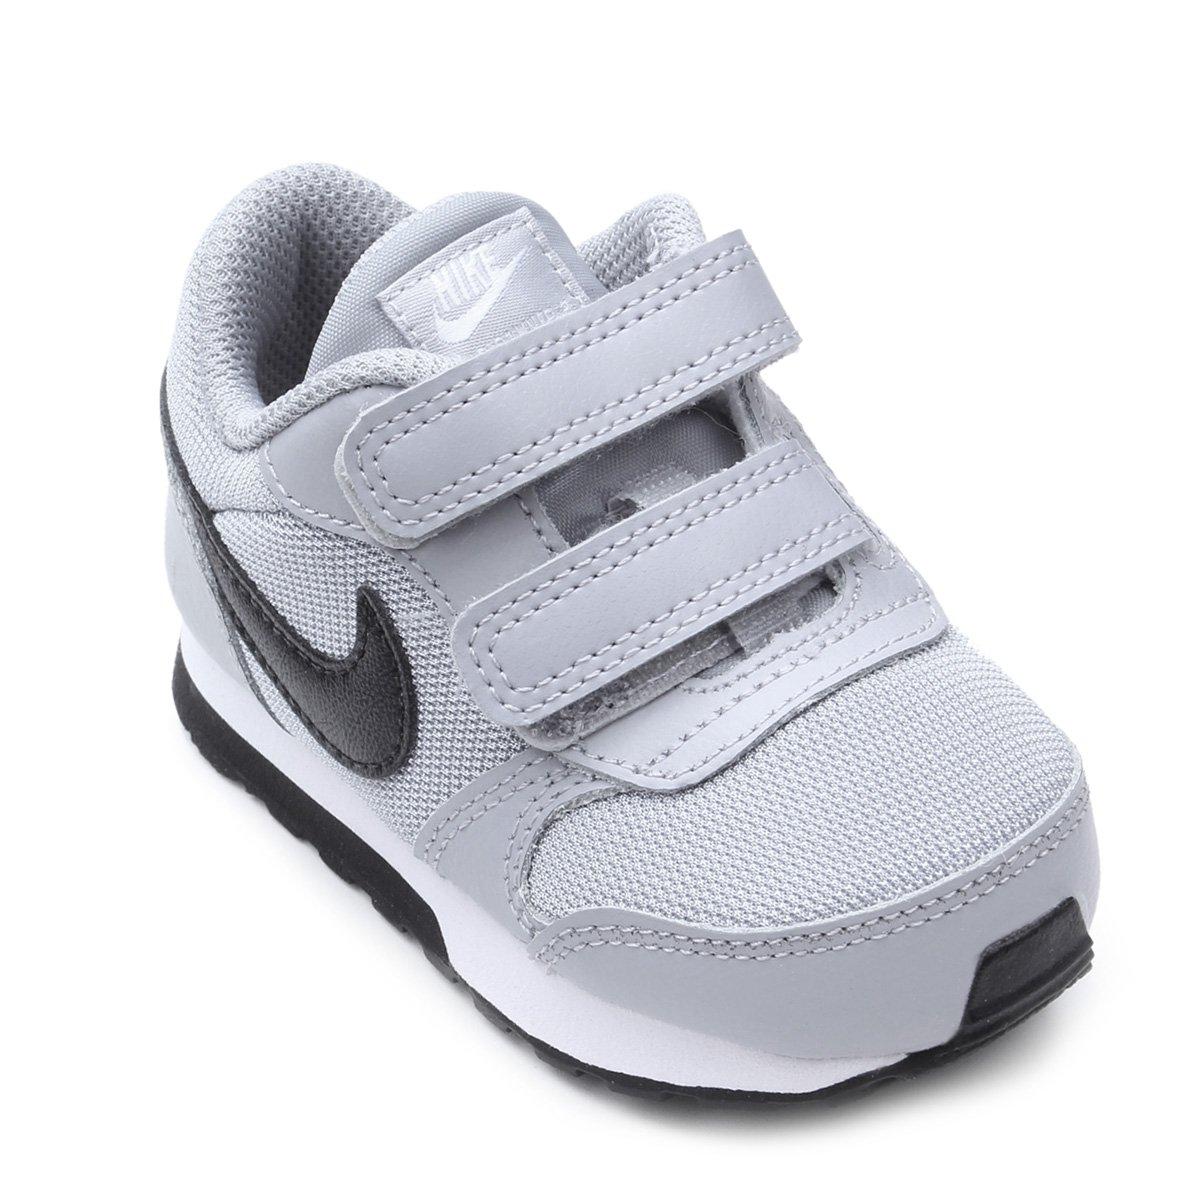 a7b3095732b Tênis Infantil Nike Mid Runner 2 - Preto e Cinza - Compre Agora ...